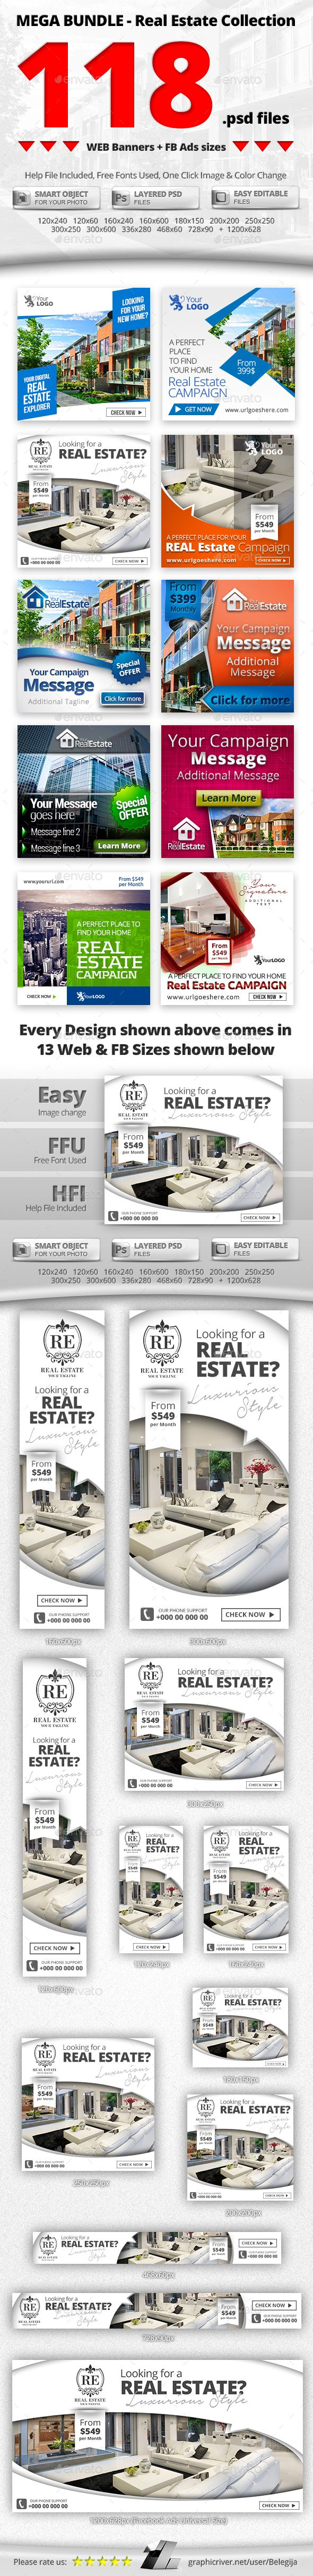 10 in 1 Real Estate Web & FB Banners - Mega Bundle 1 - Banners & Ads Web Elements Download here : https://graphicriver.net/item/10-in-1-real-estate-web-fb-banners-mega-bundle-1/19578337?s_rank=87&ref=Al-fatih